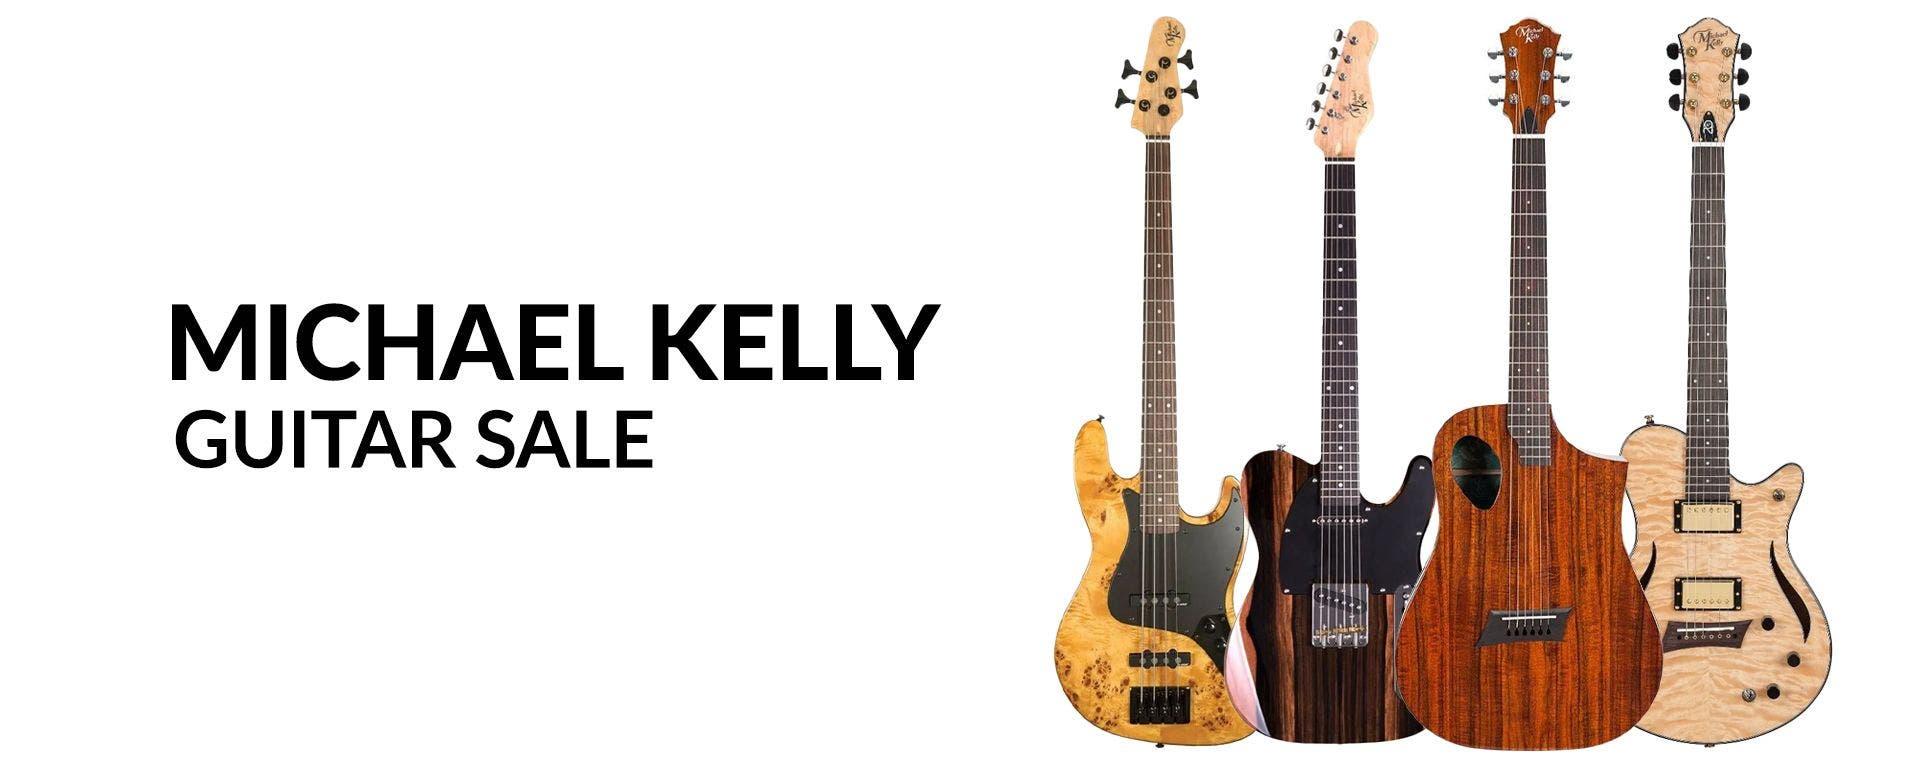 Michael Kelly Guitar Sale at Sam Ash